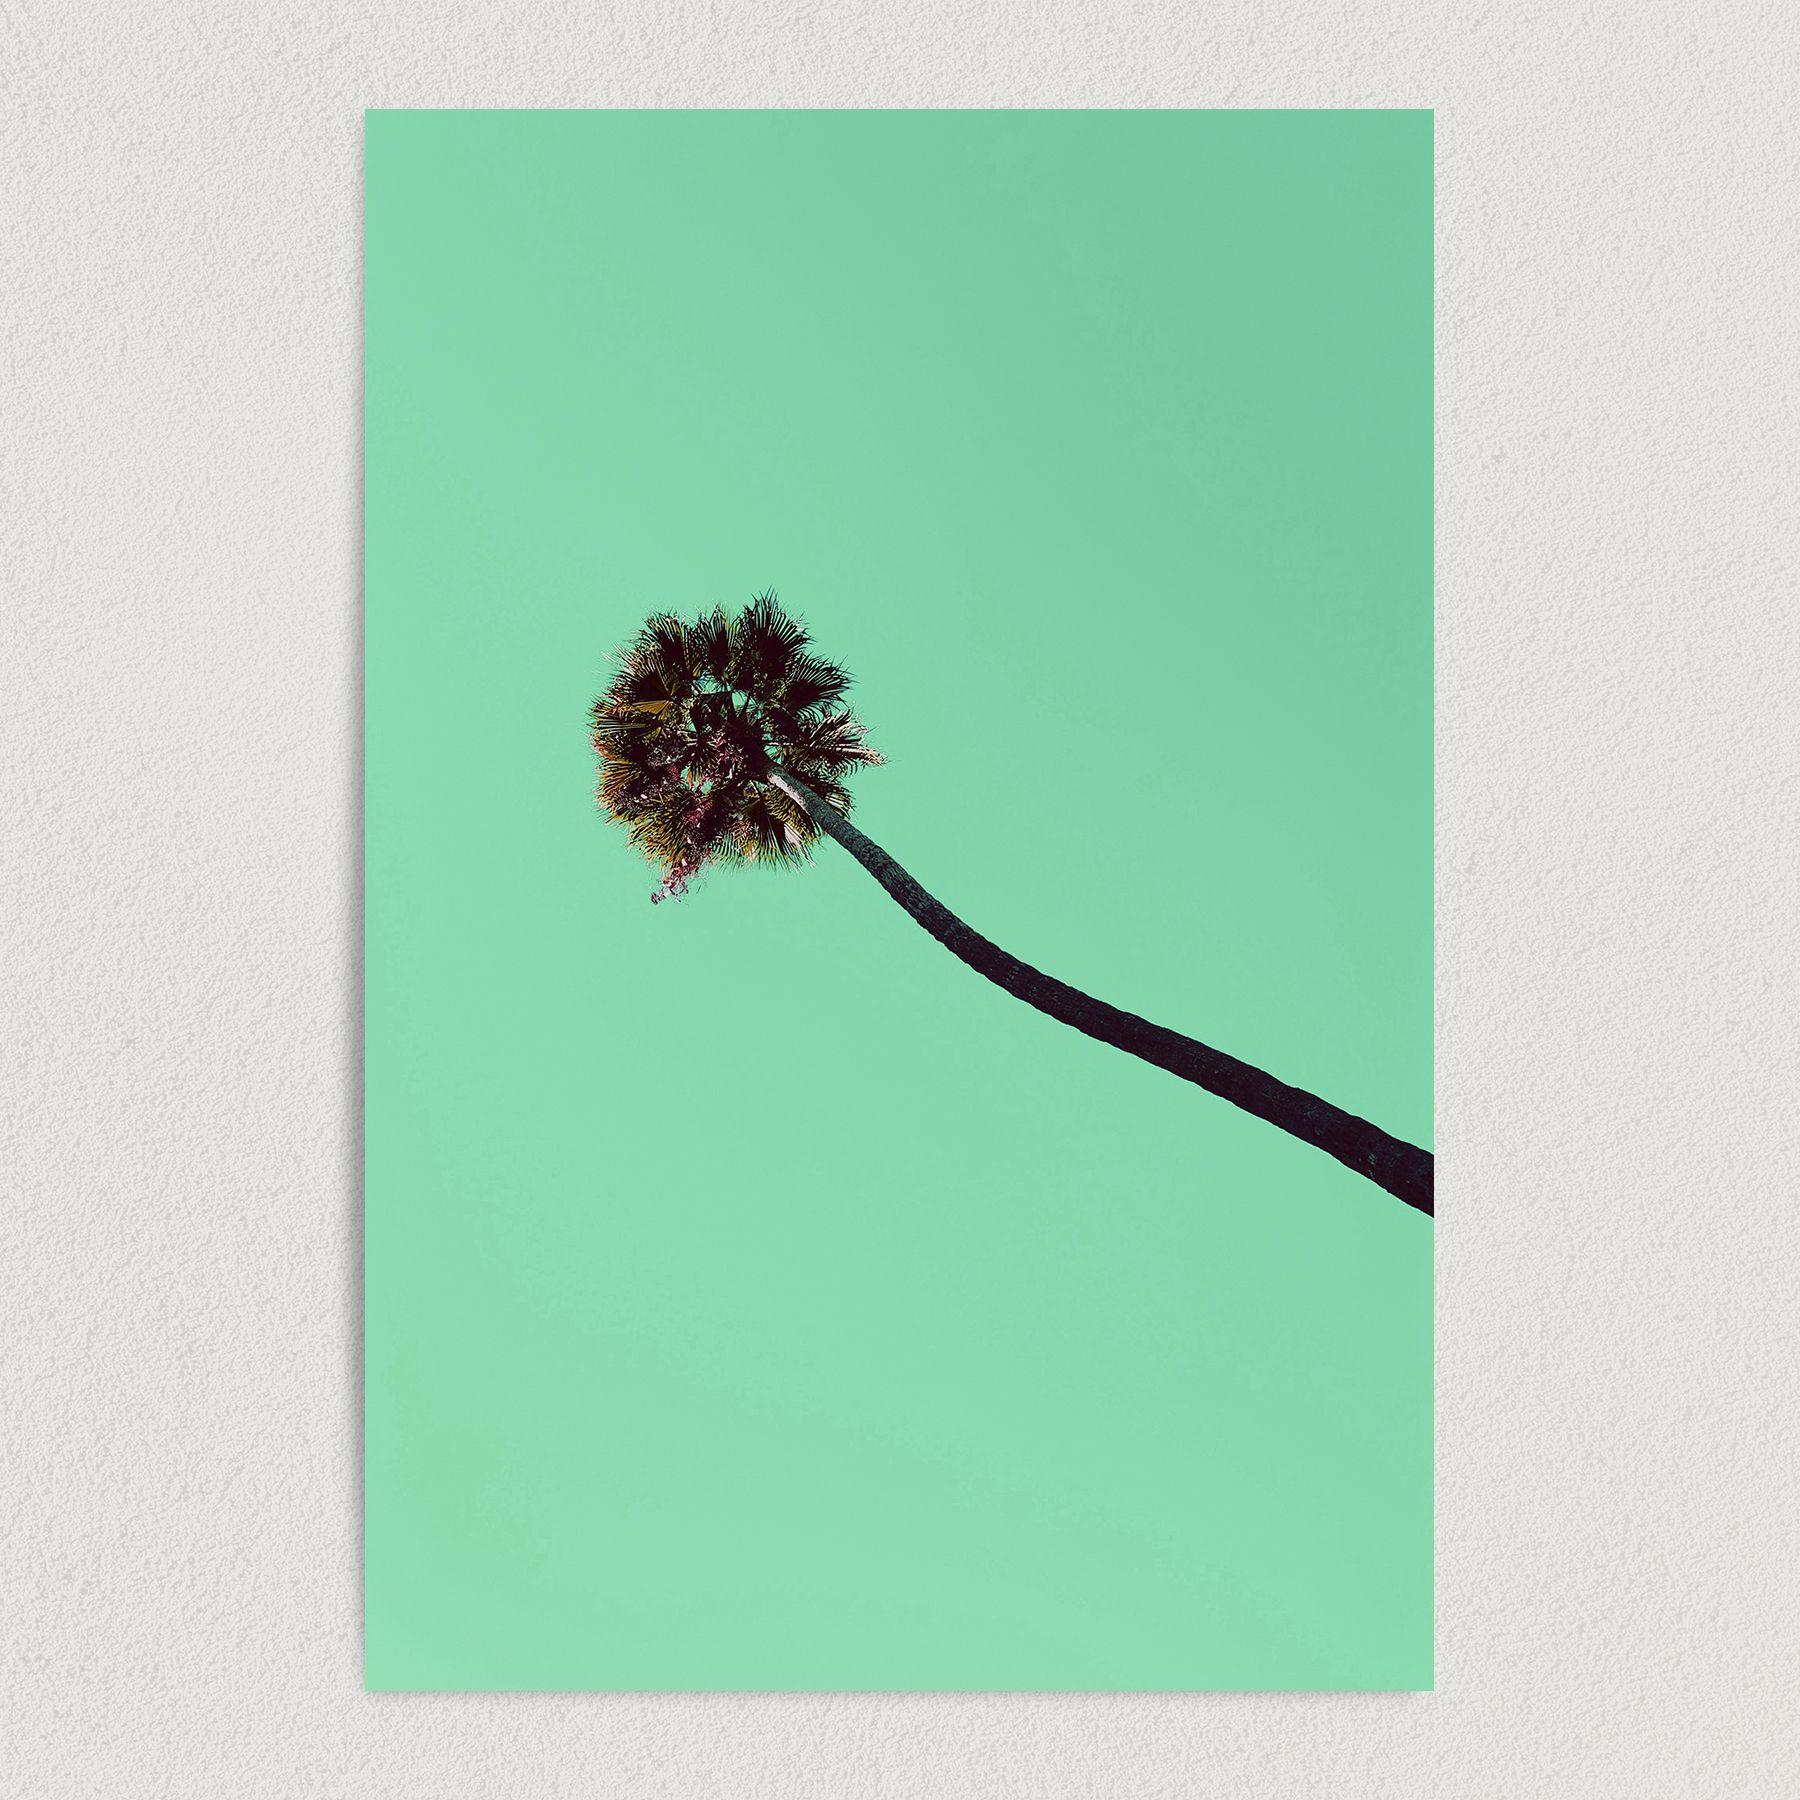 Green Palm Tree Los Angeles Retro 90's Art Print Poster R1004